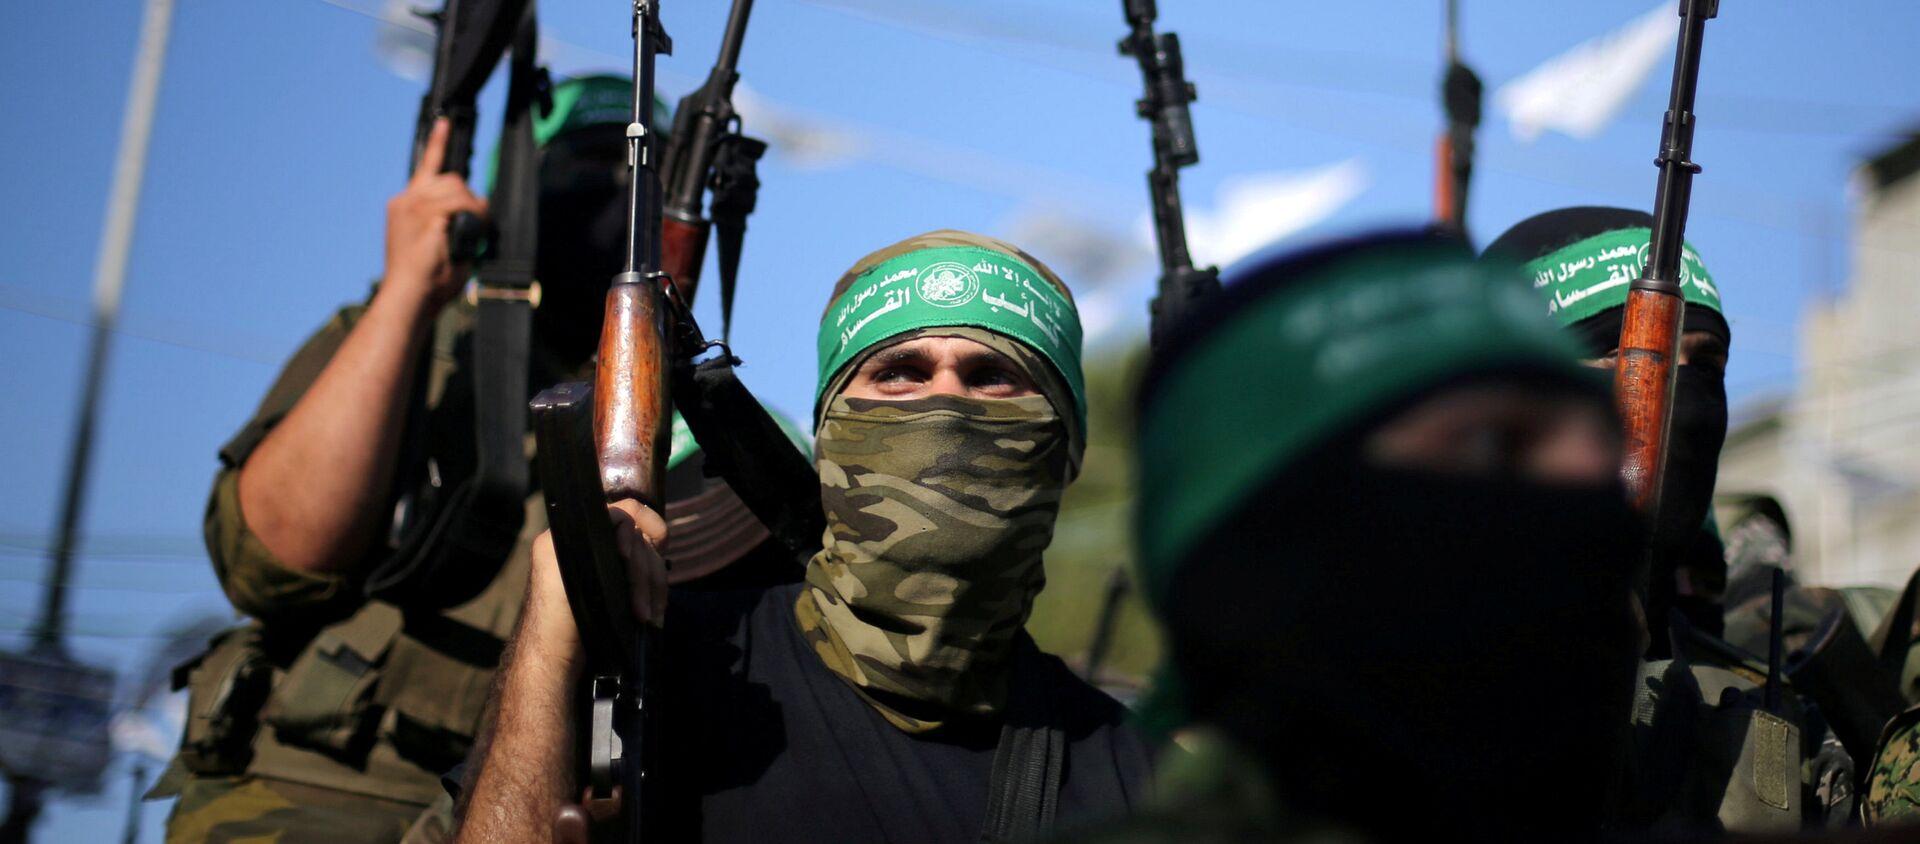 Militanti Hamas (foto d'archivio) - Sputnik Italia, 1920, 12.05.2021